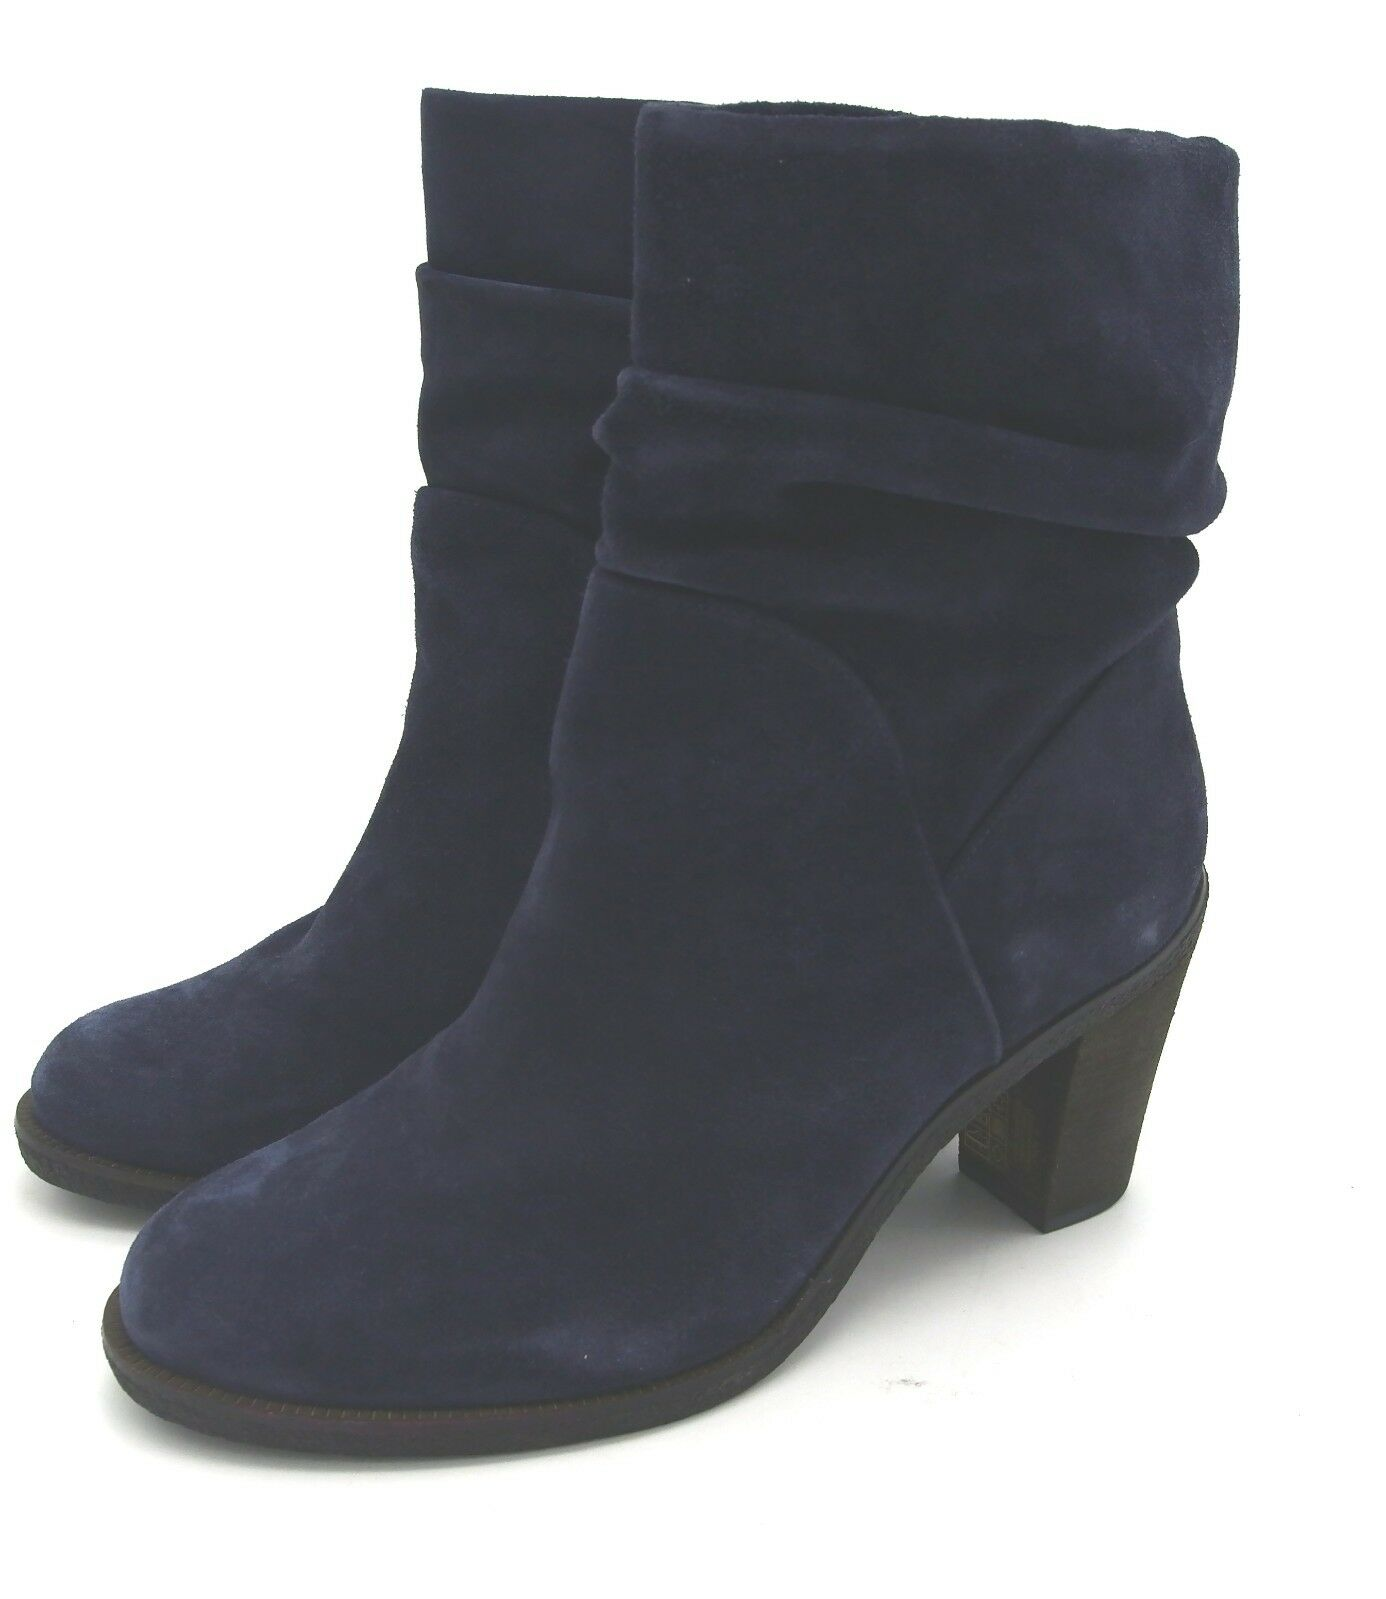 J6657 Women's Vince Camuto Parka Verona Suede Dark Navy Ankle Boot 10 M